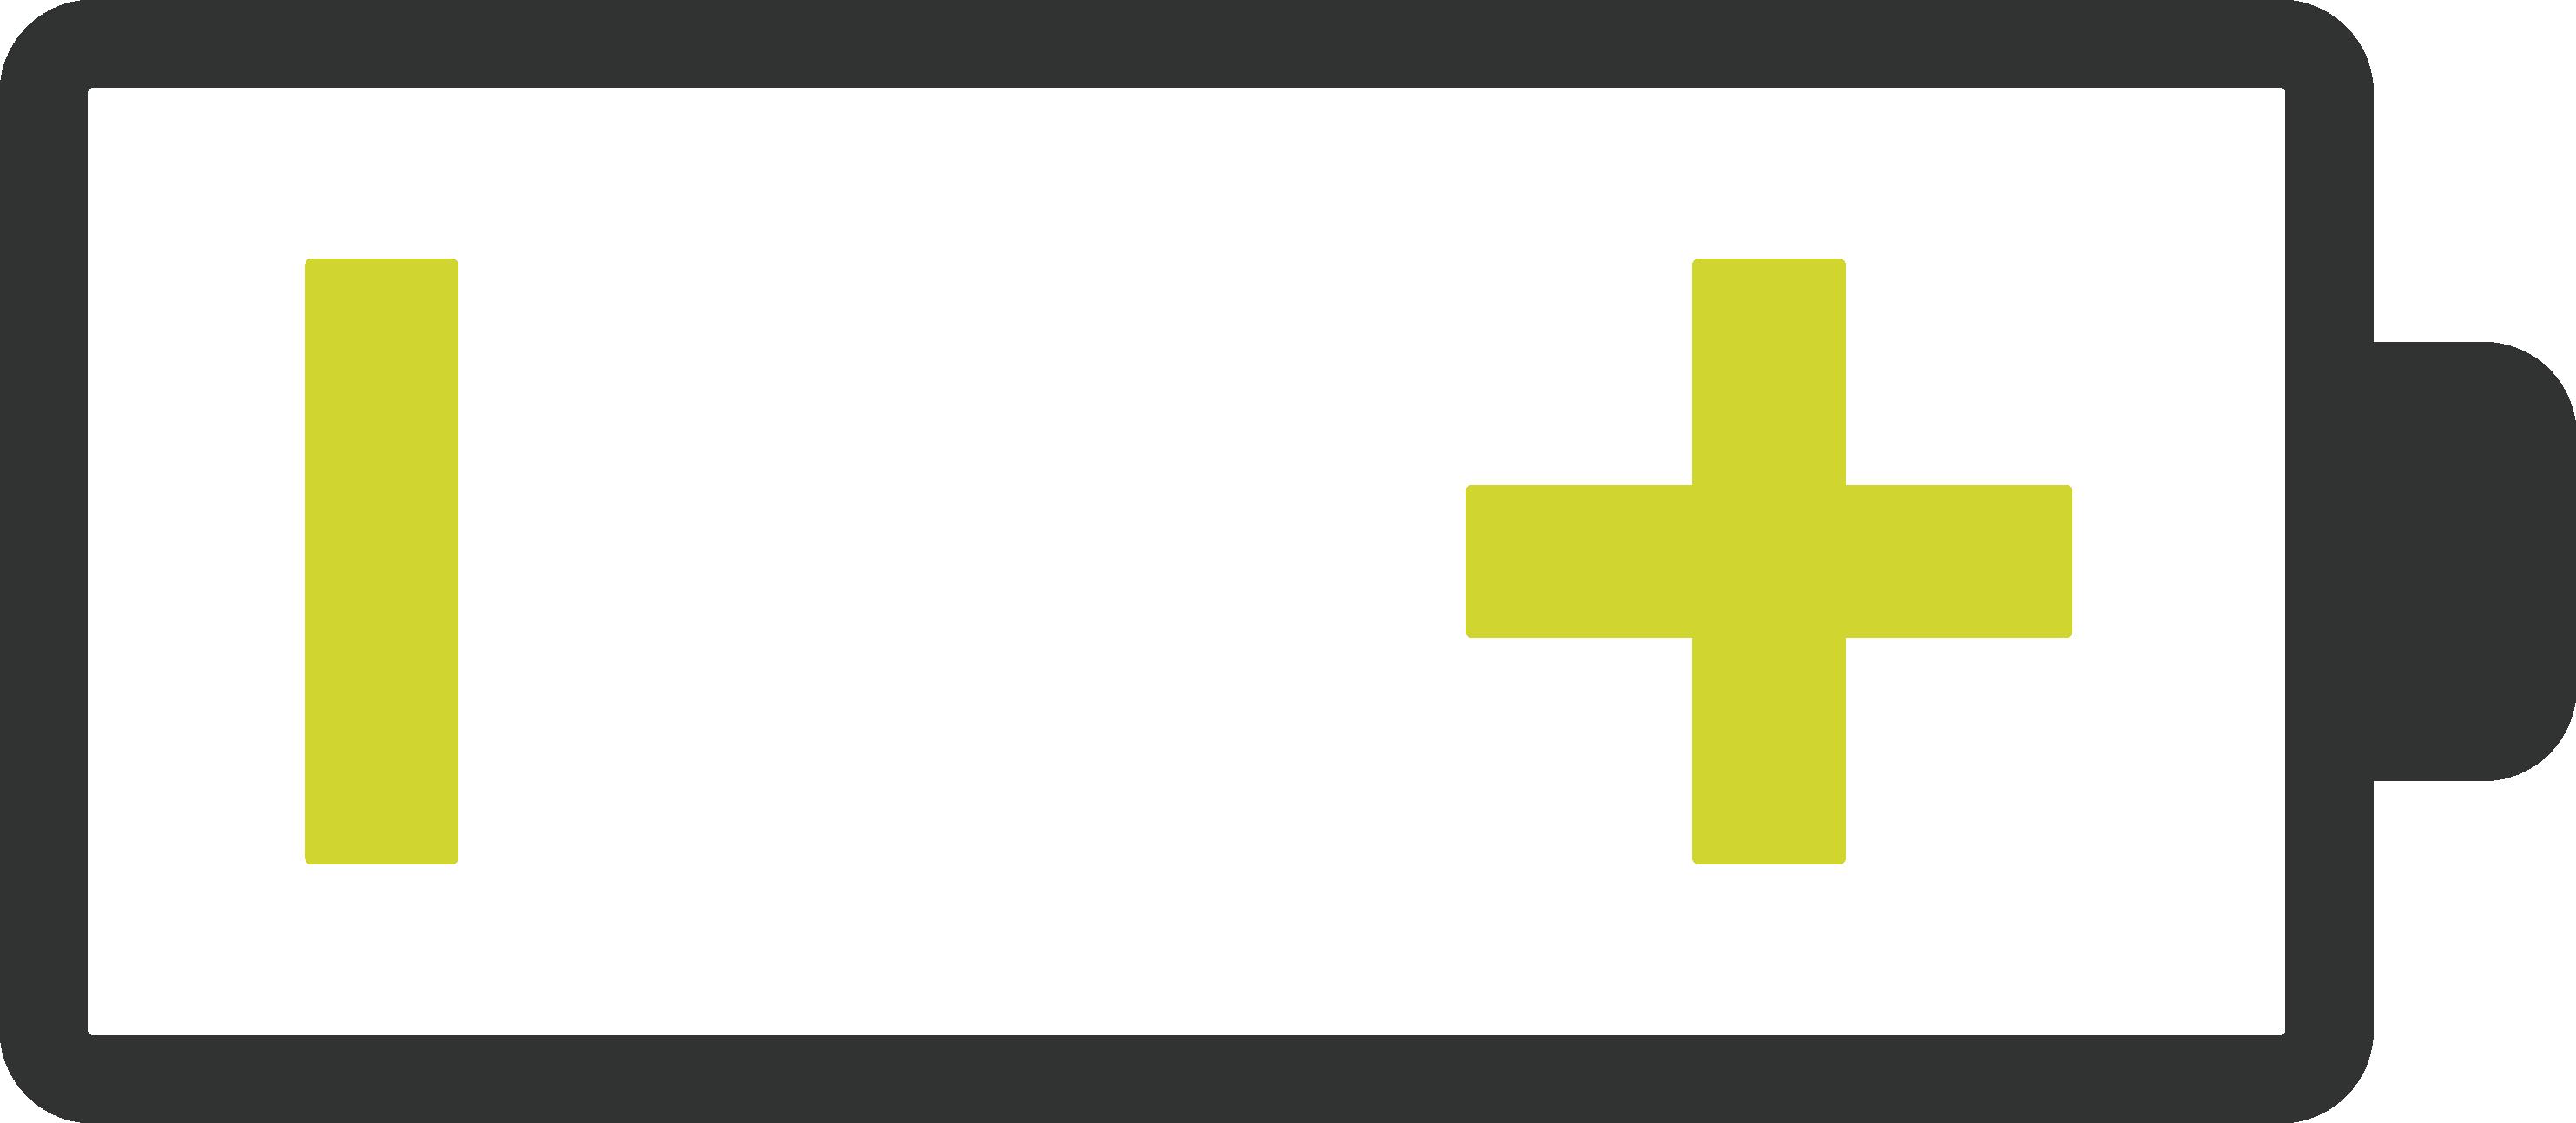 download hd logo brand font battery vector transparent png image nicepng com battery vector transparent png image